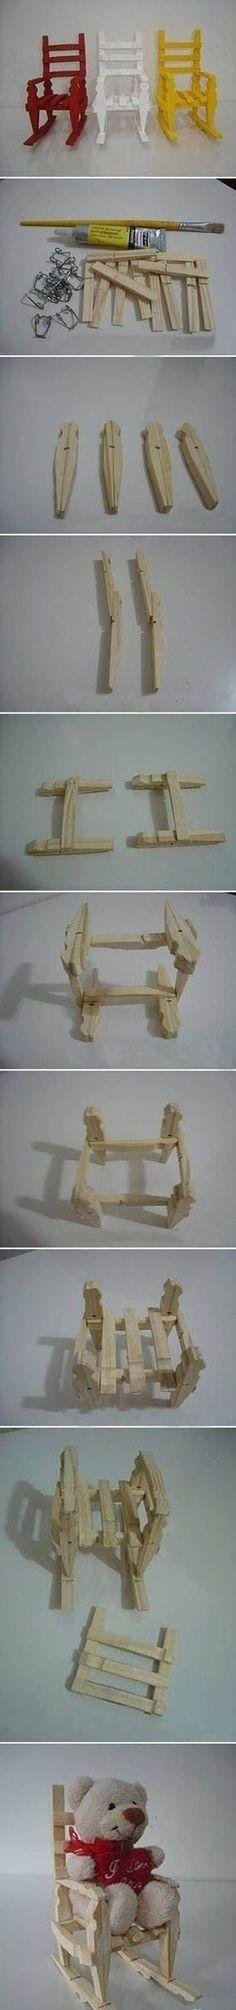 cadeira de balanço feita de pregadores de roupas